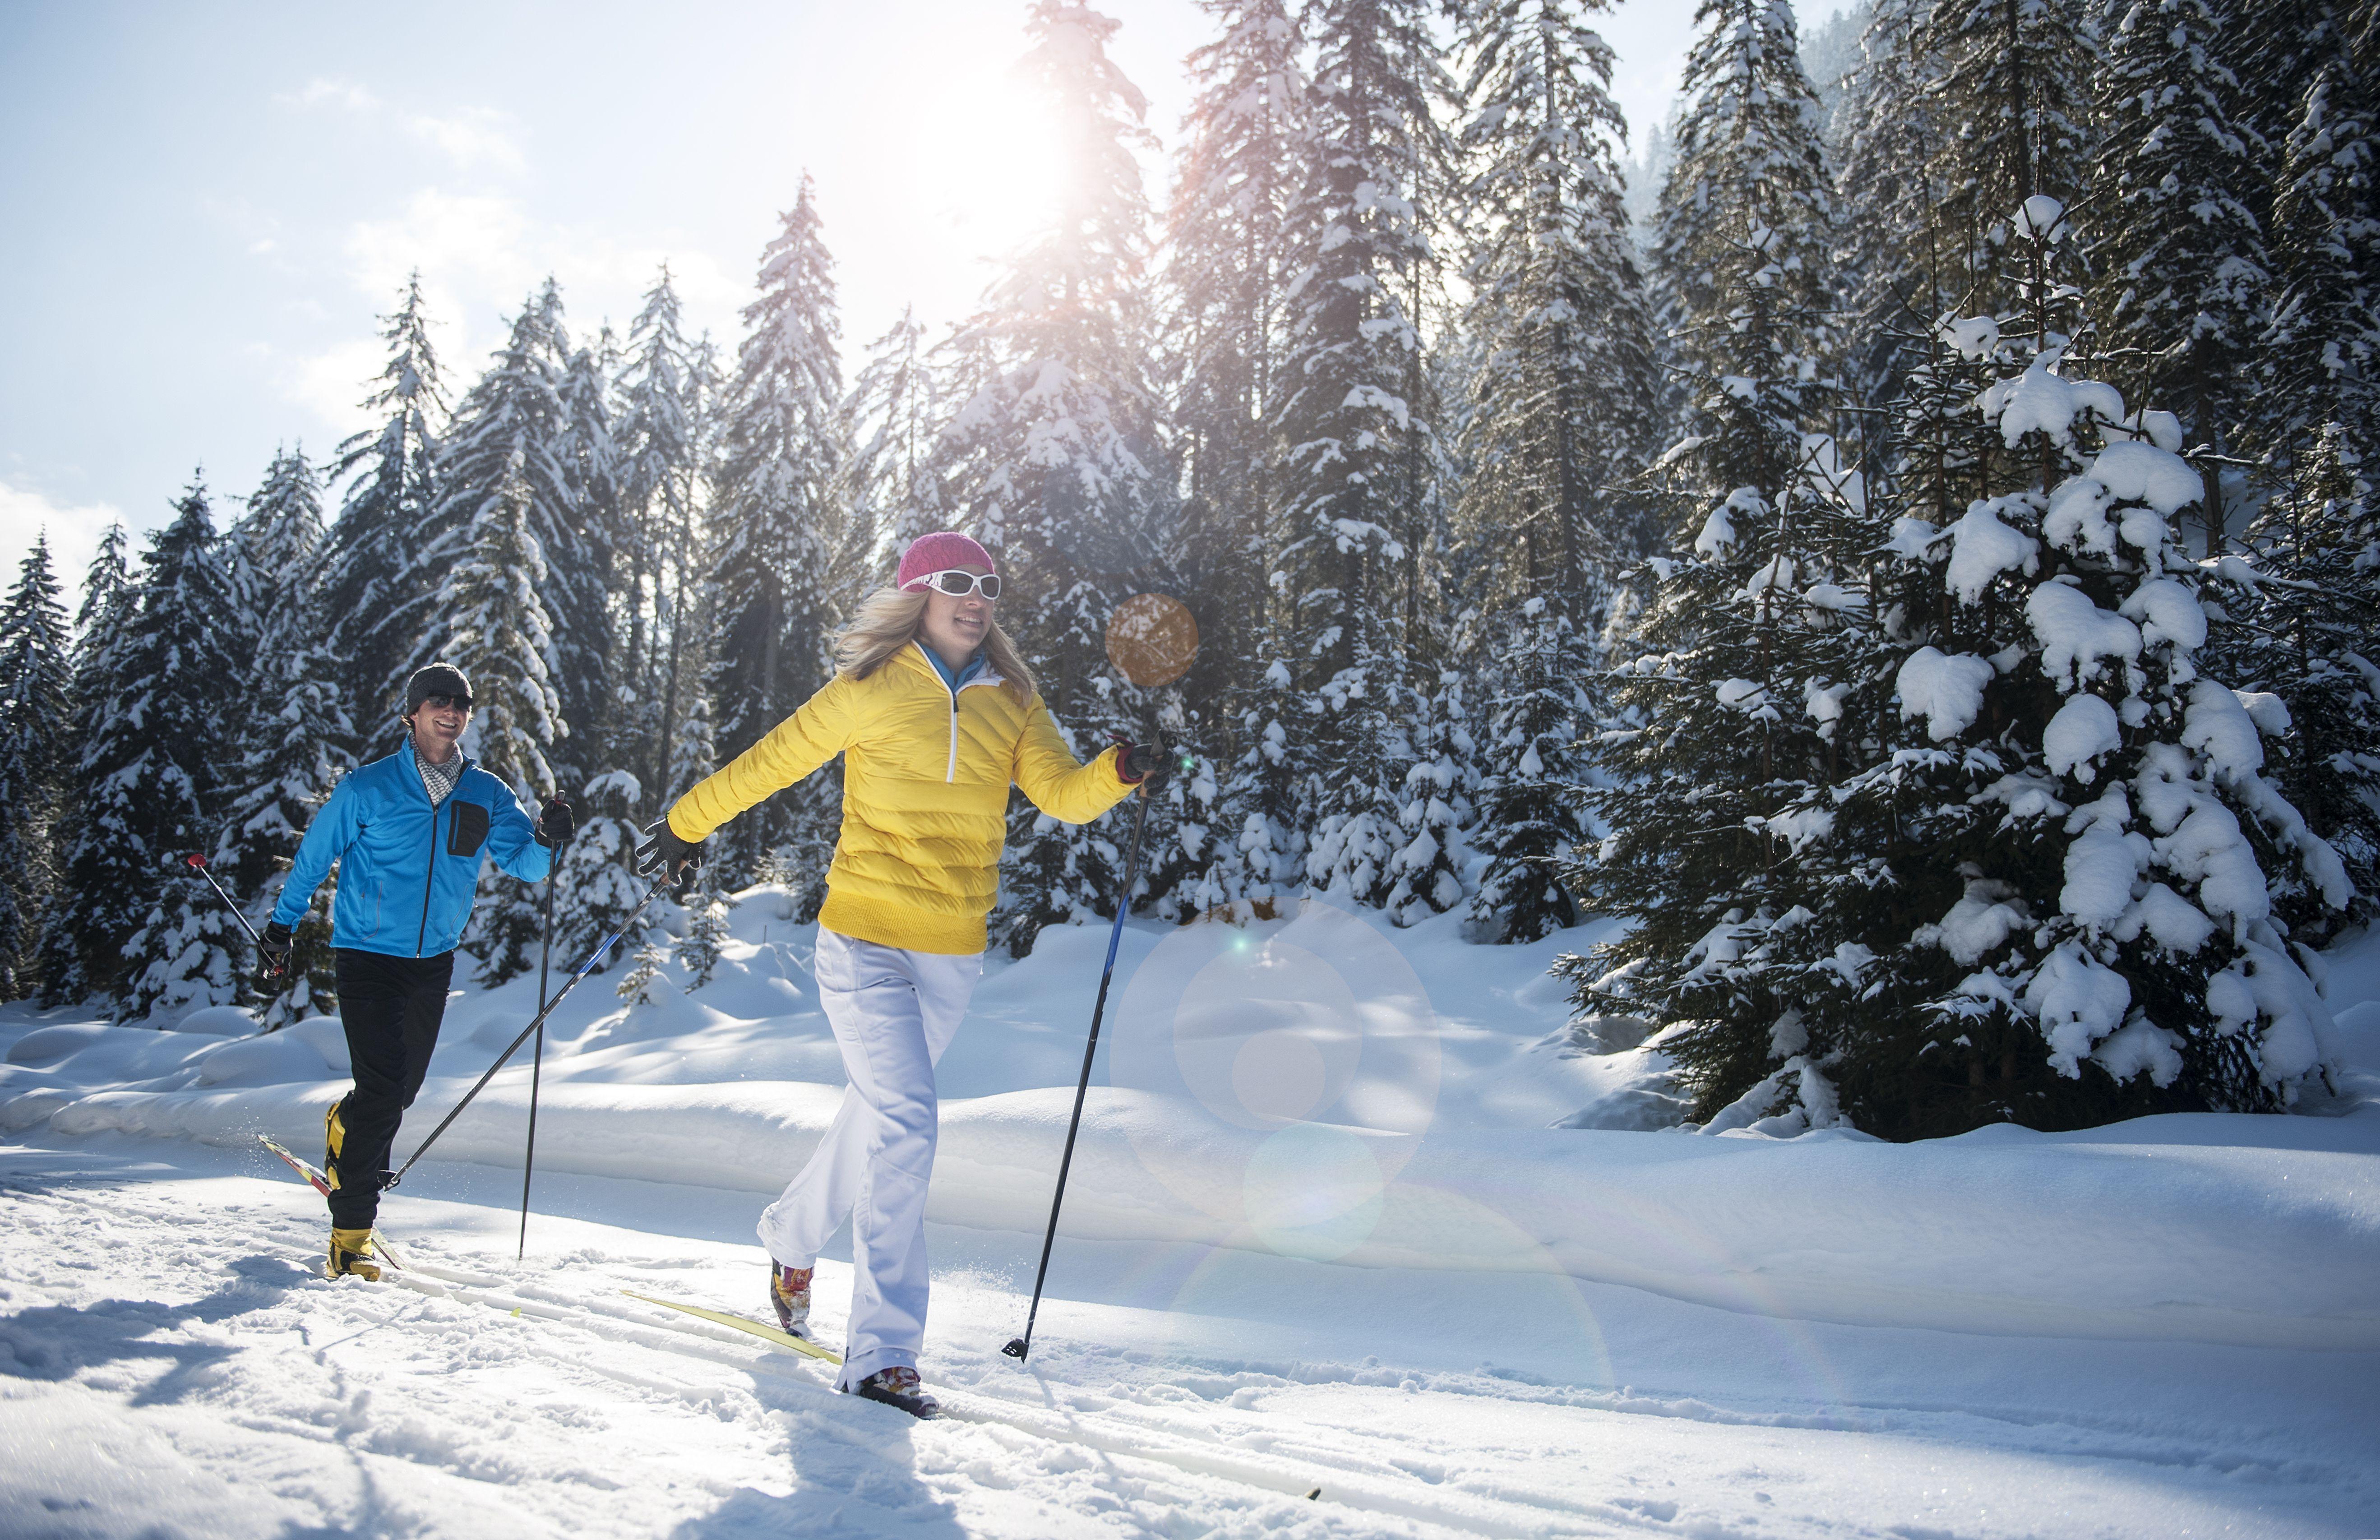 cross-country skiing 101